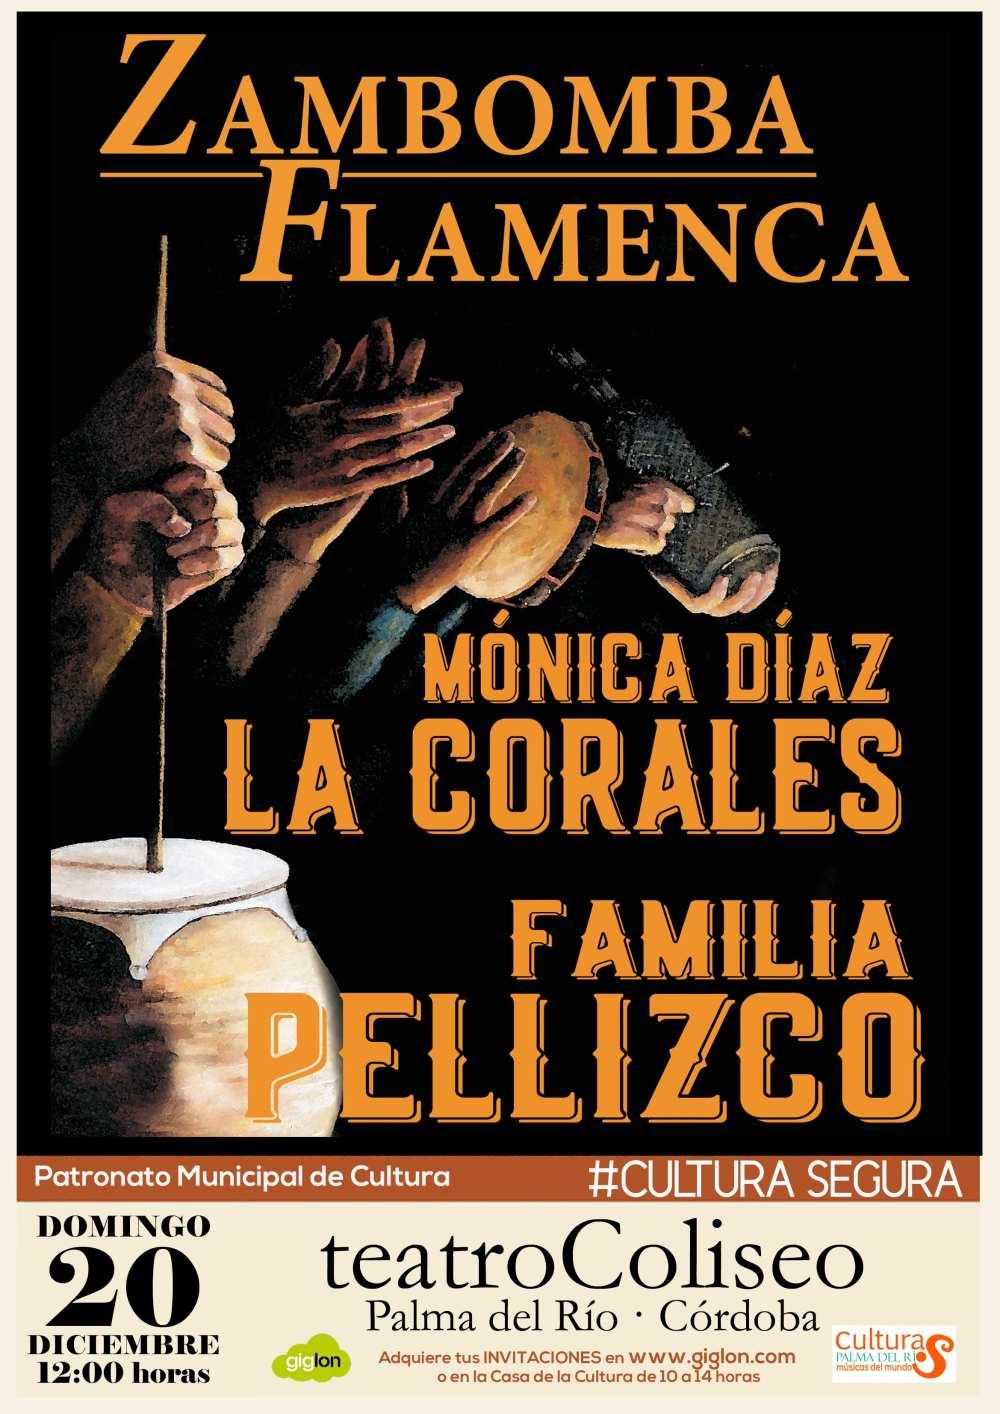 https://www.palmadelrio.es/sites/default/files/zambombaweb-20-12-a3v.jpg